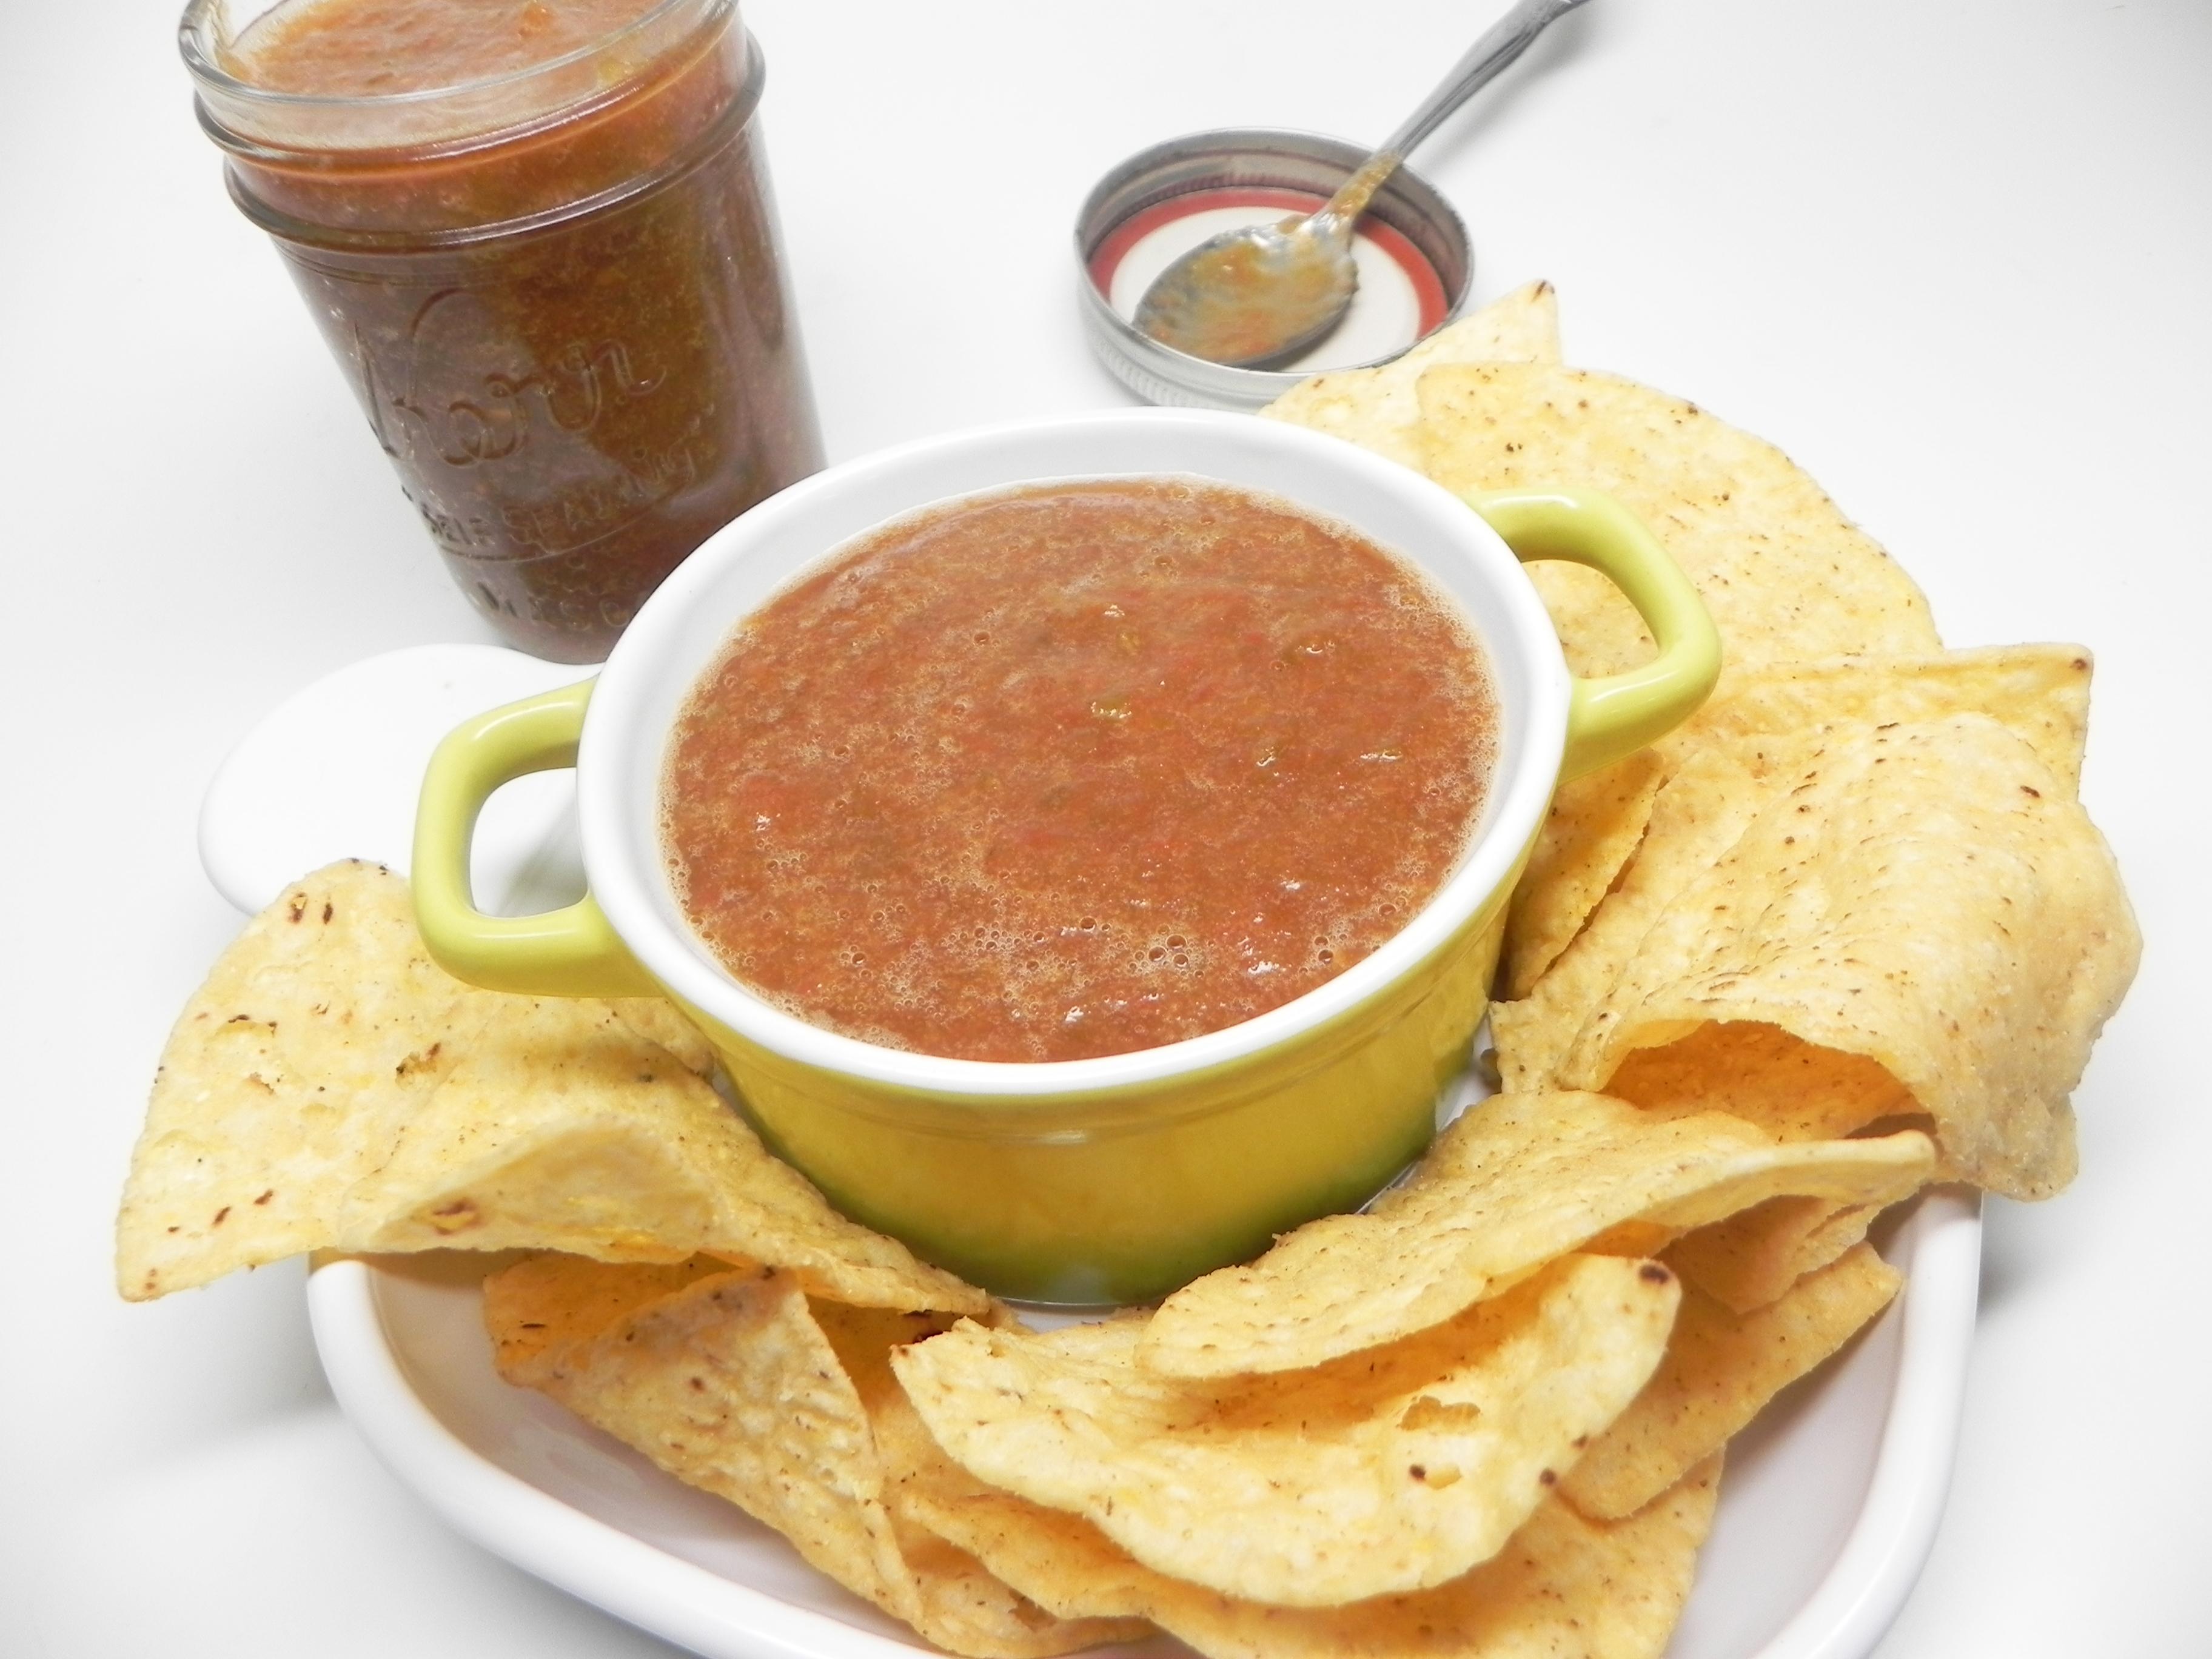 Jalapeno Homemade Hot Sauce